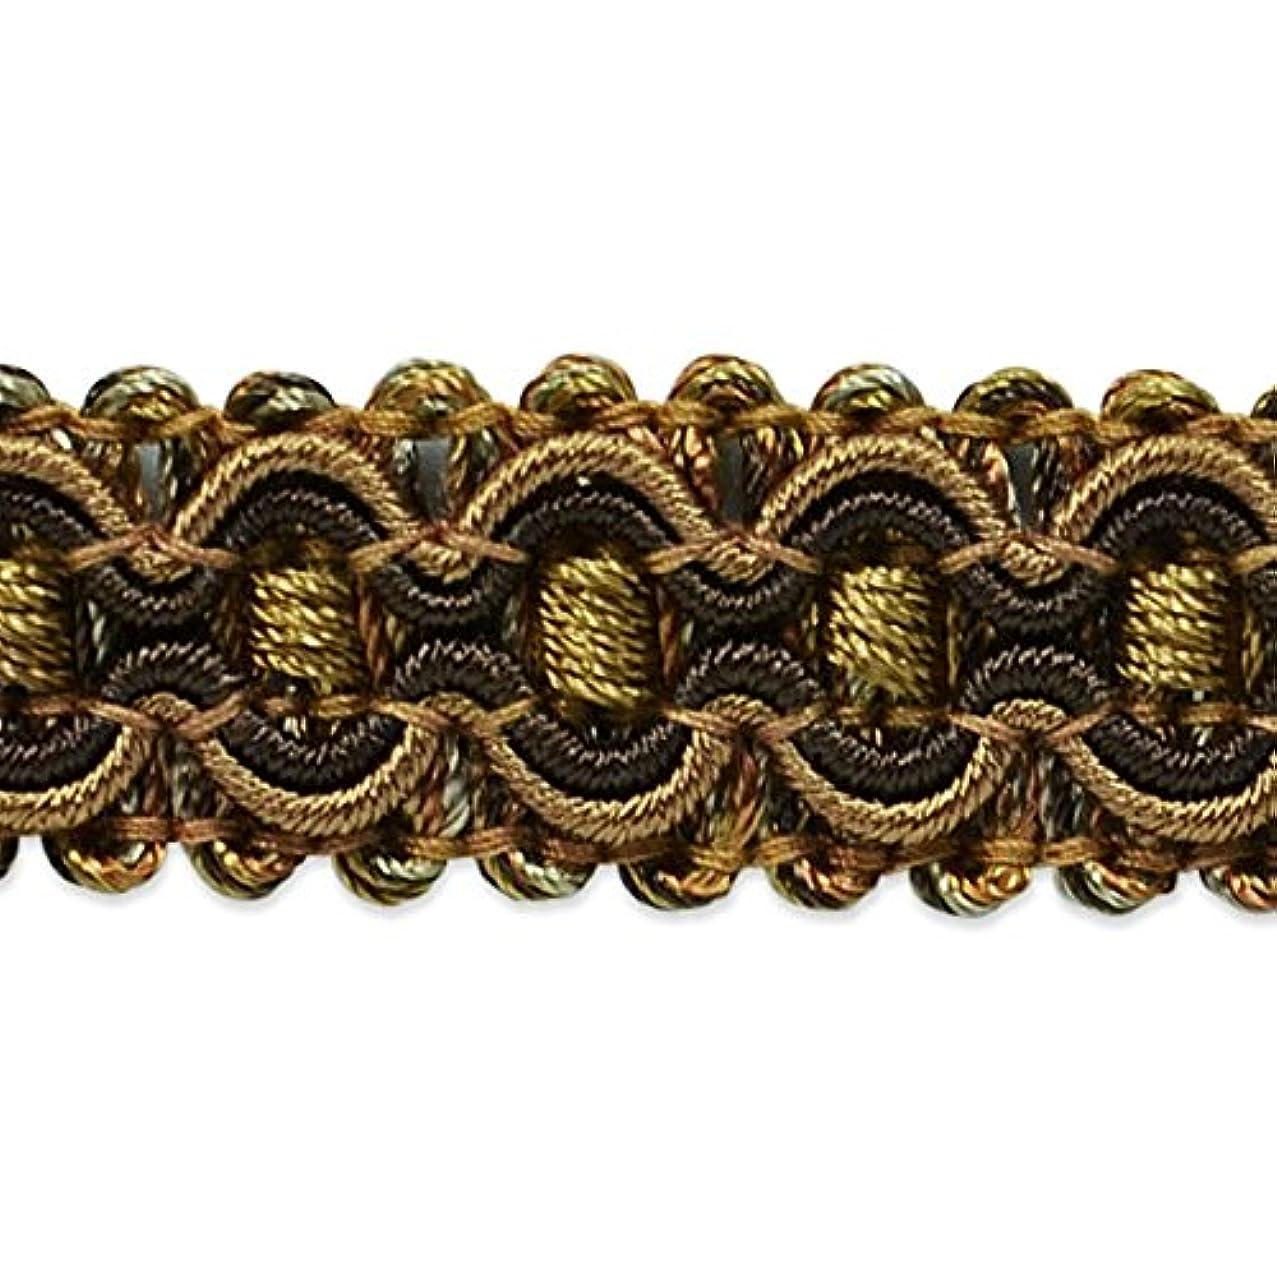 Expo International Gabrielle Decorative Braid Trim Embellishment, 20-Yard, Brown/Cinnamon